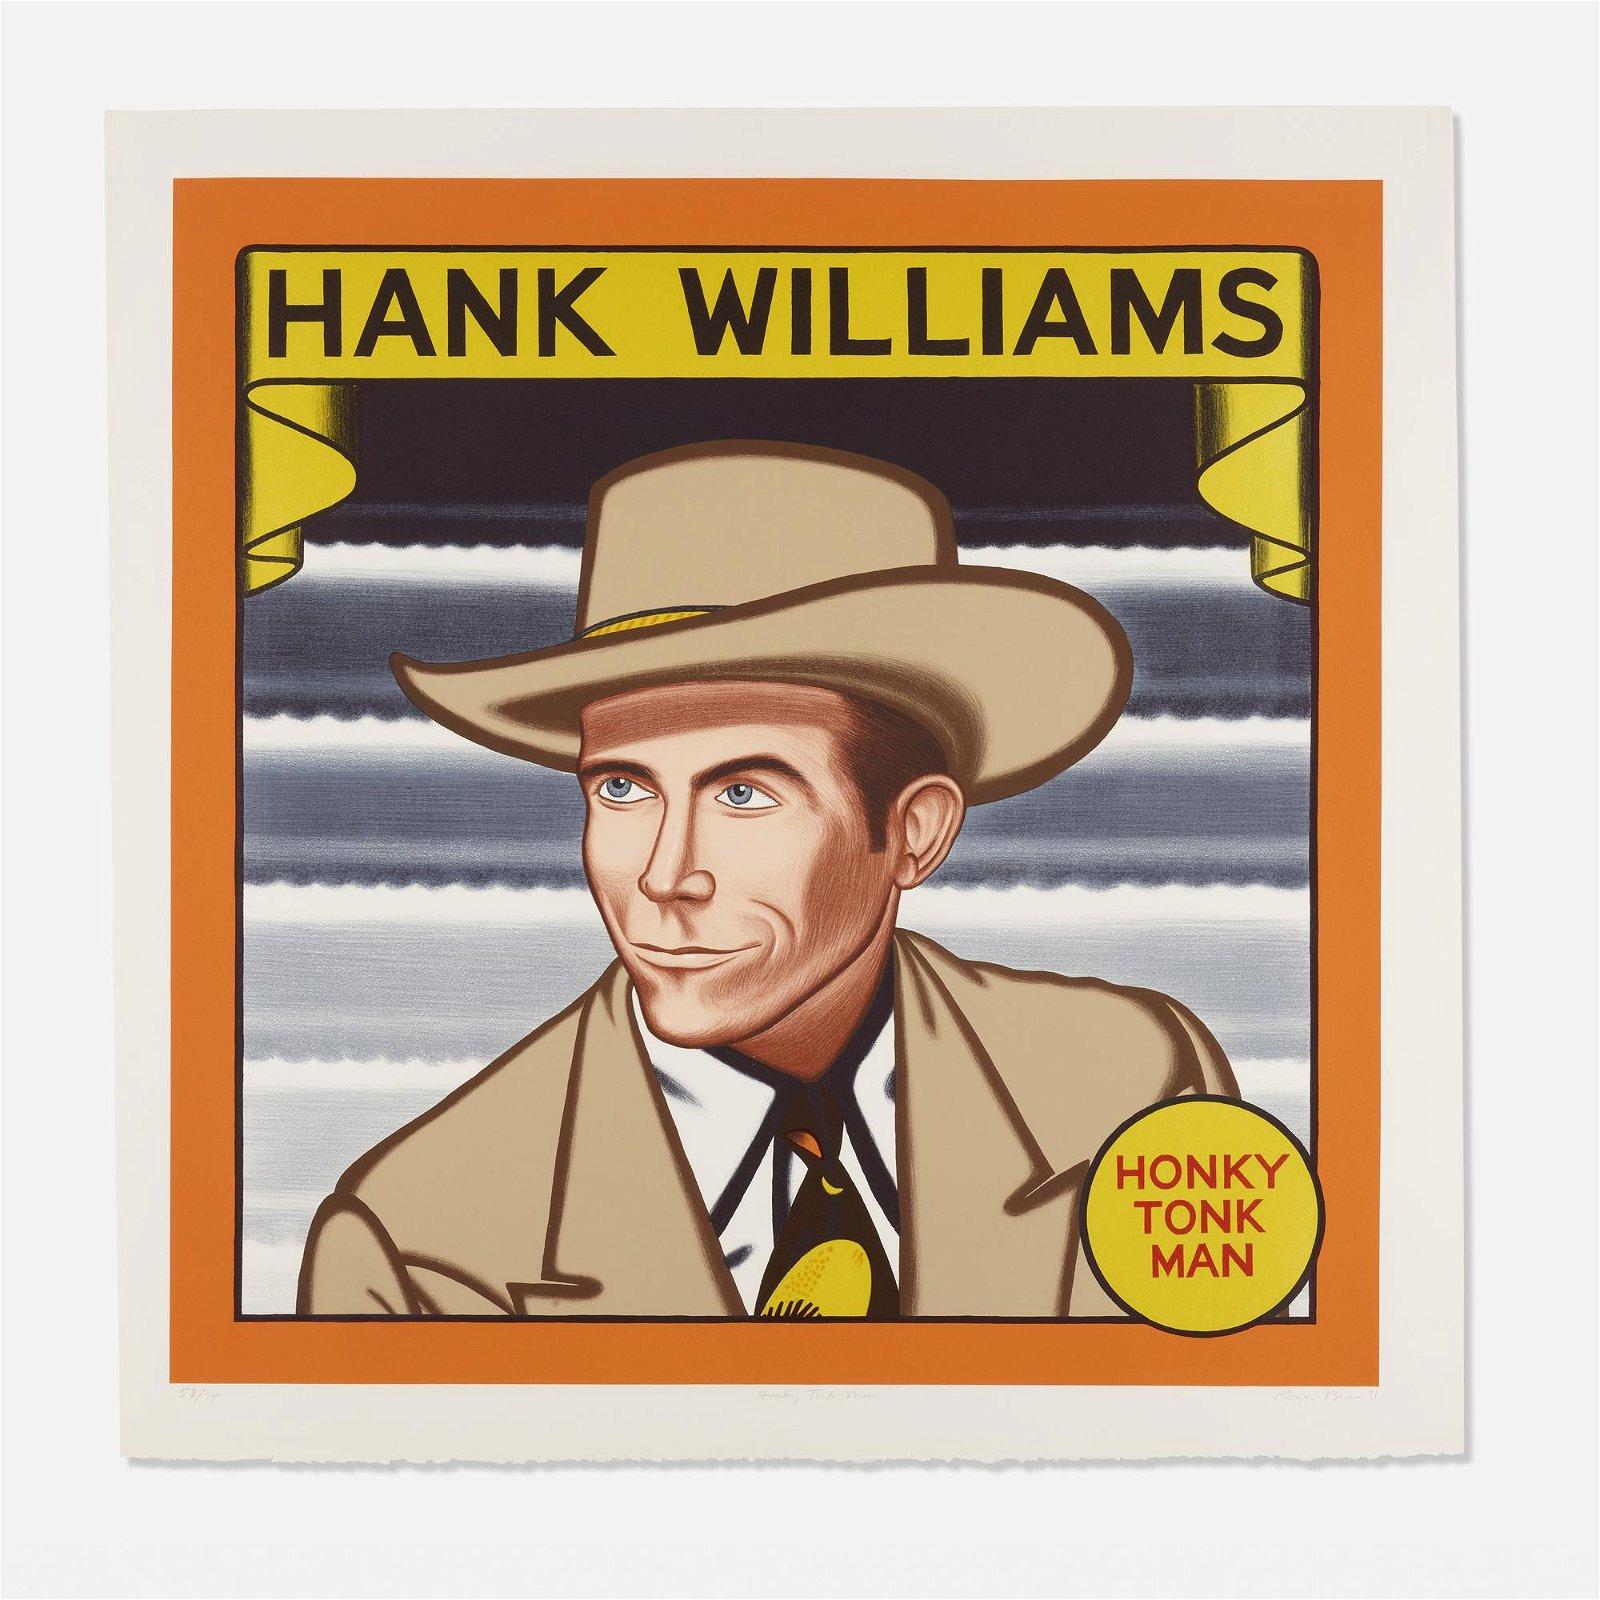 Roger Brown, Hank Williams, Honky Tonk Man